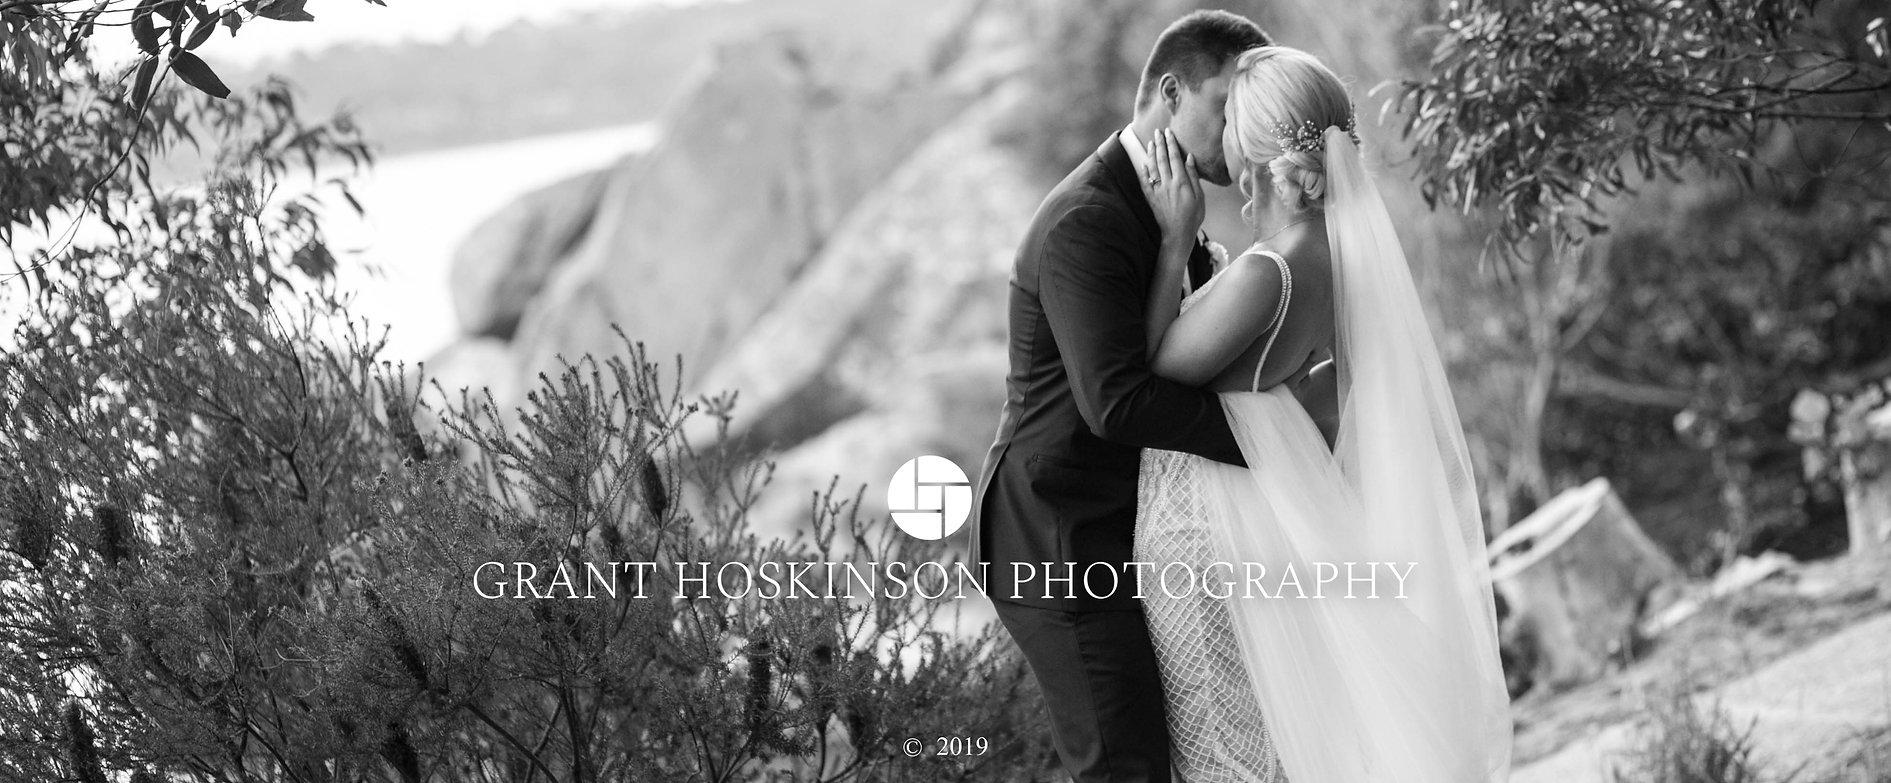 Bride and groom kissing. Sydney wedding photographer Grant Hoskinson Photographer.